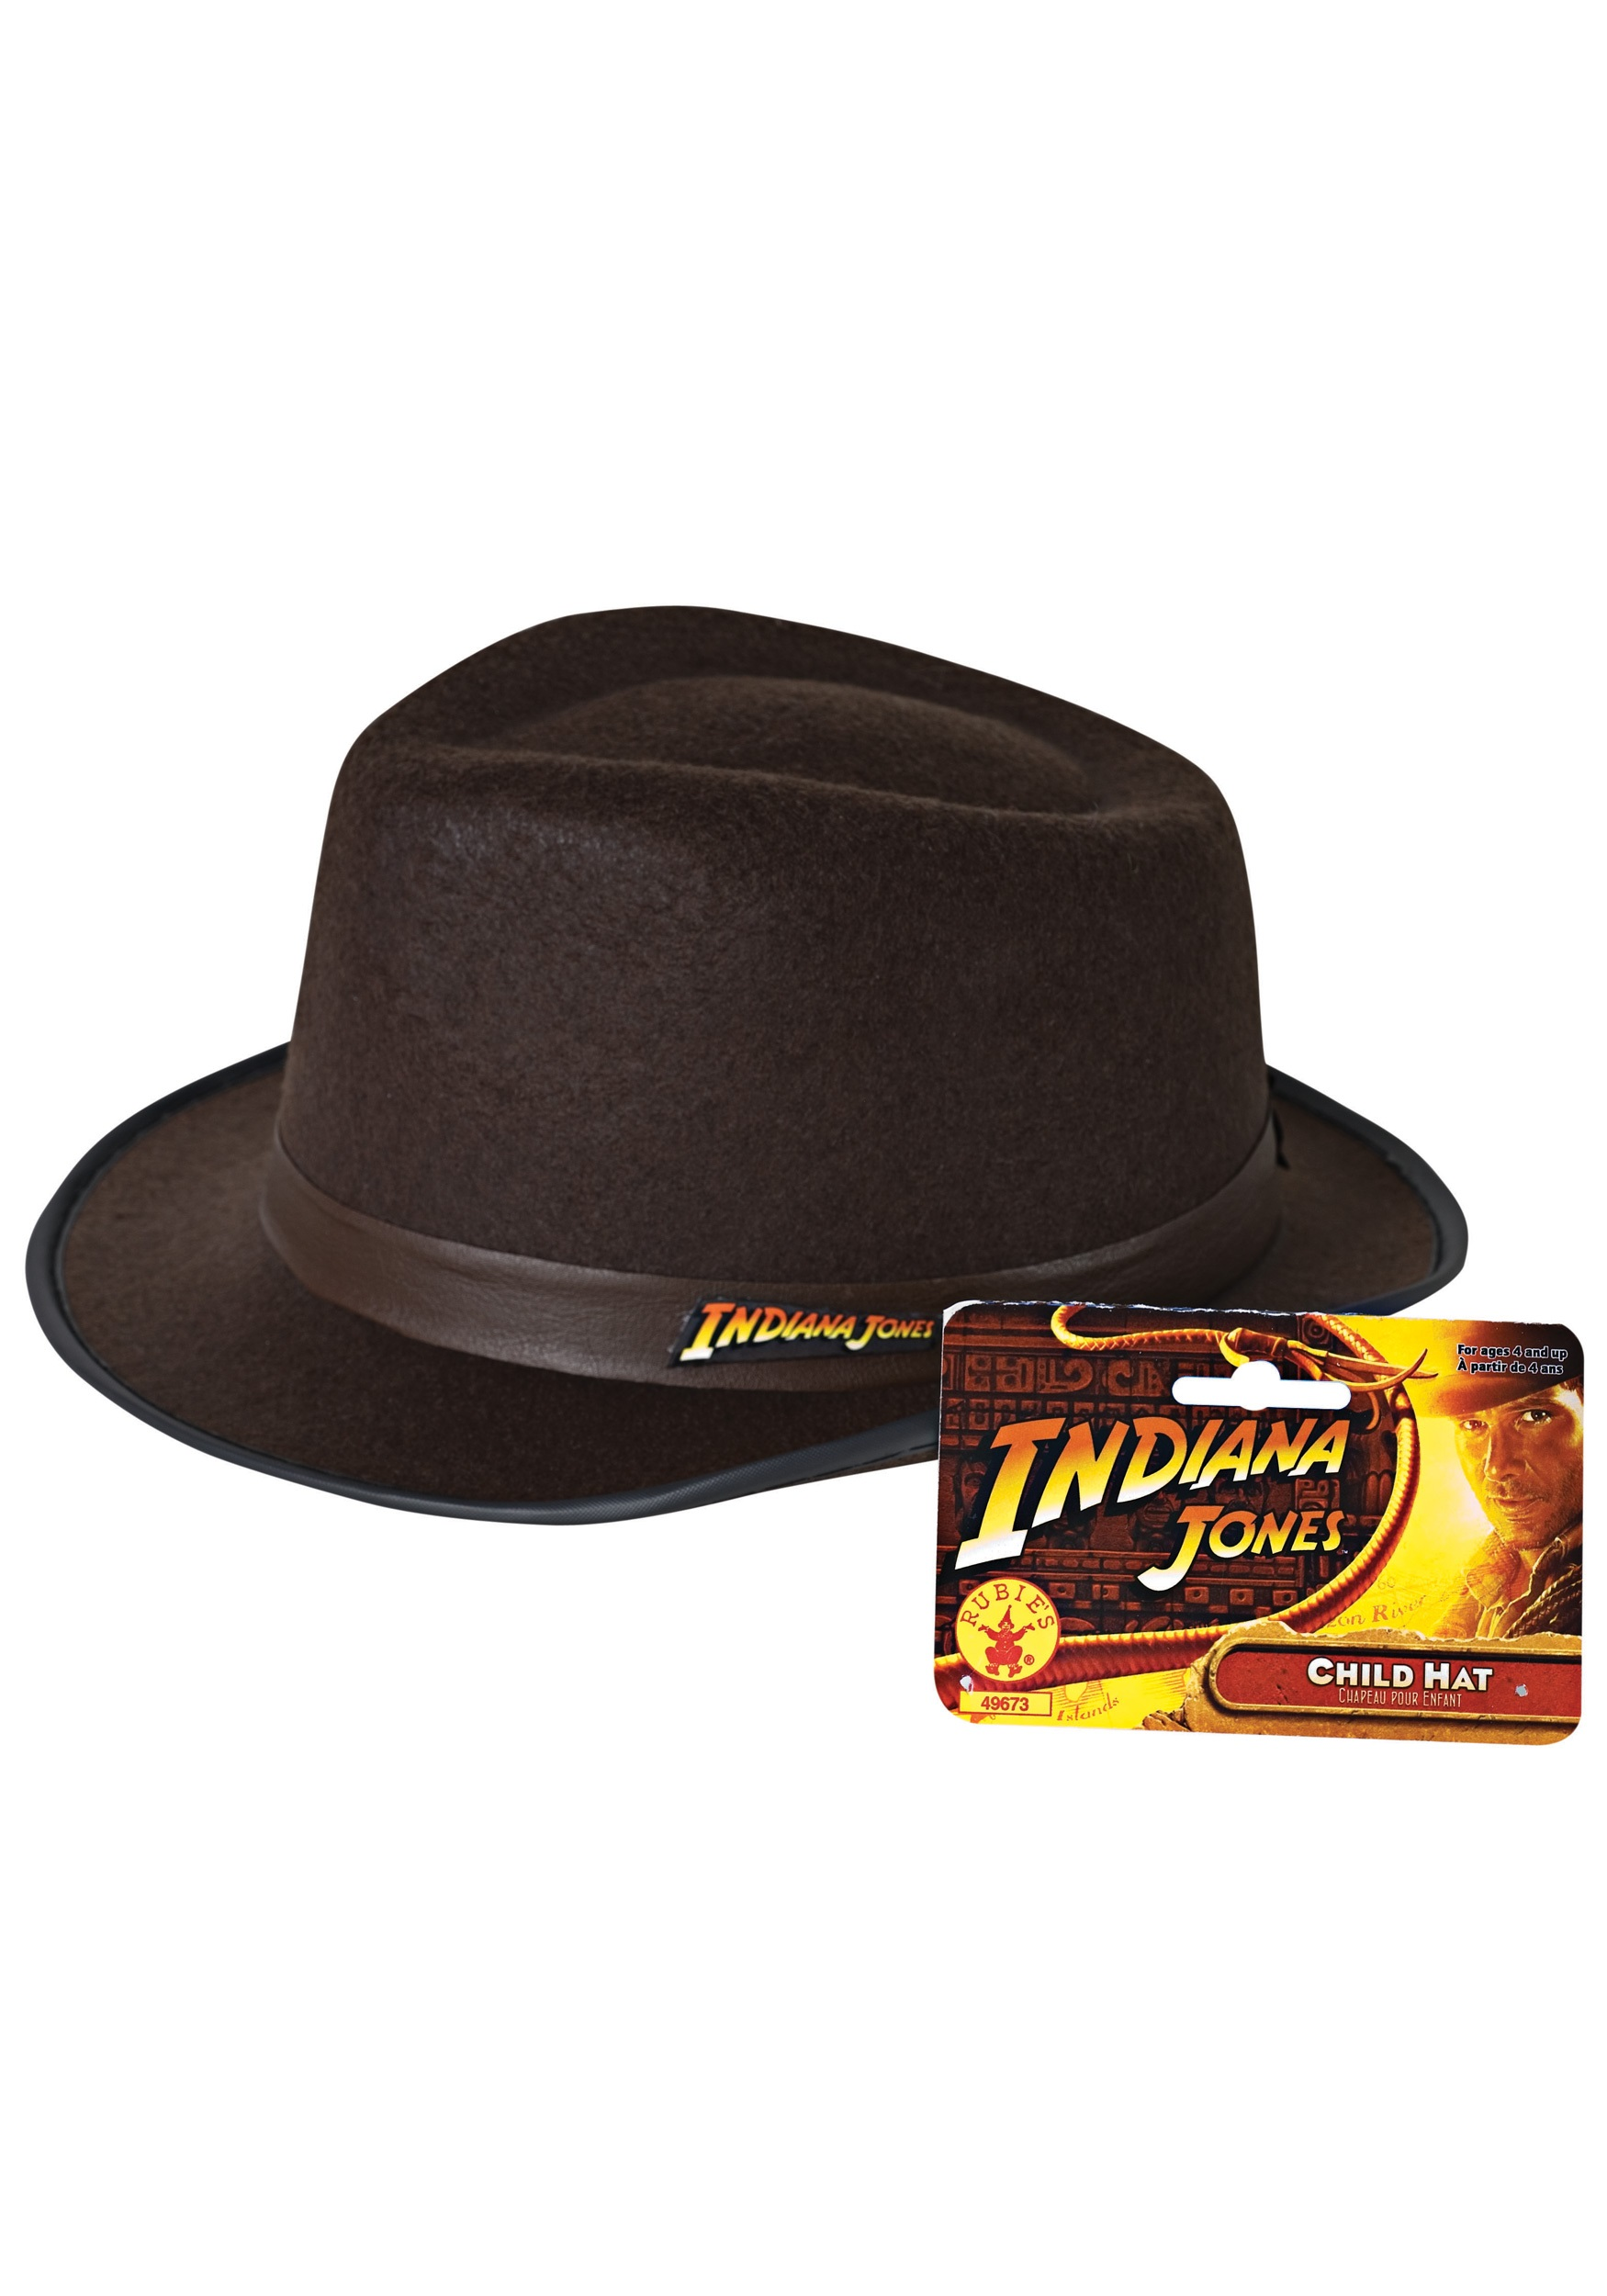 9cc4fb40d7b4e indiana-jones-child-hat.jpg